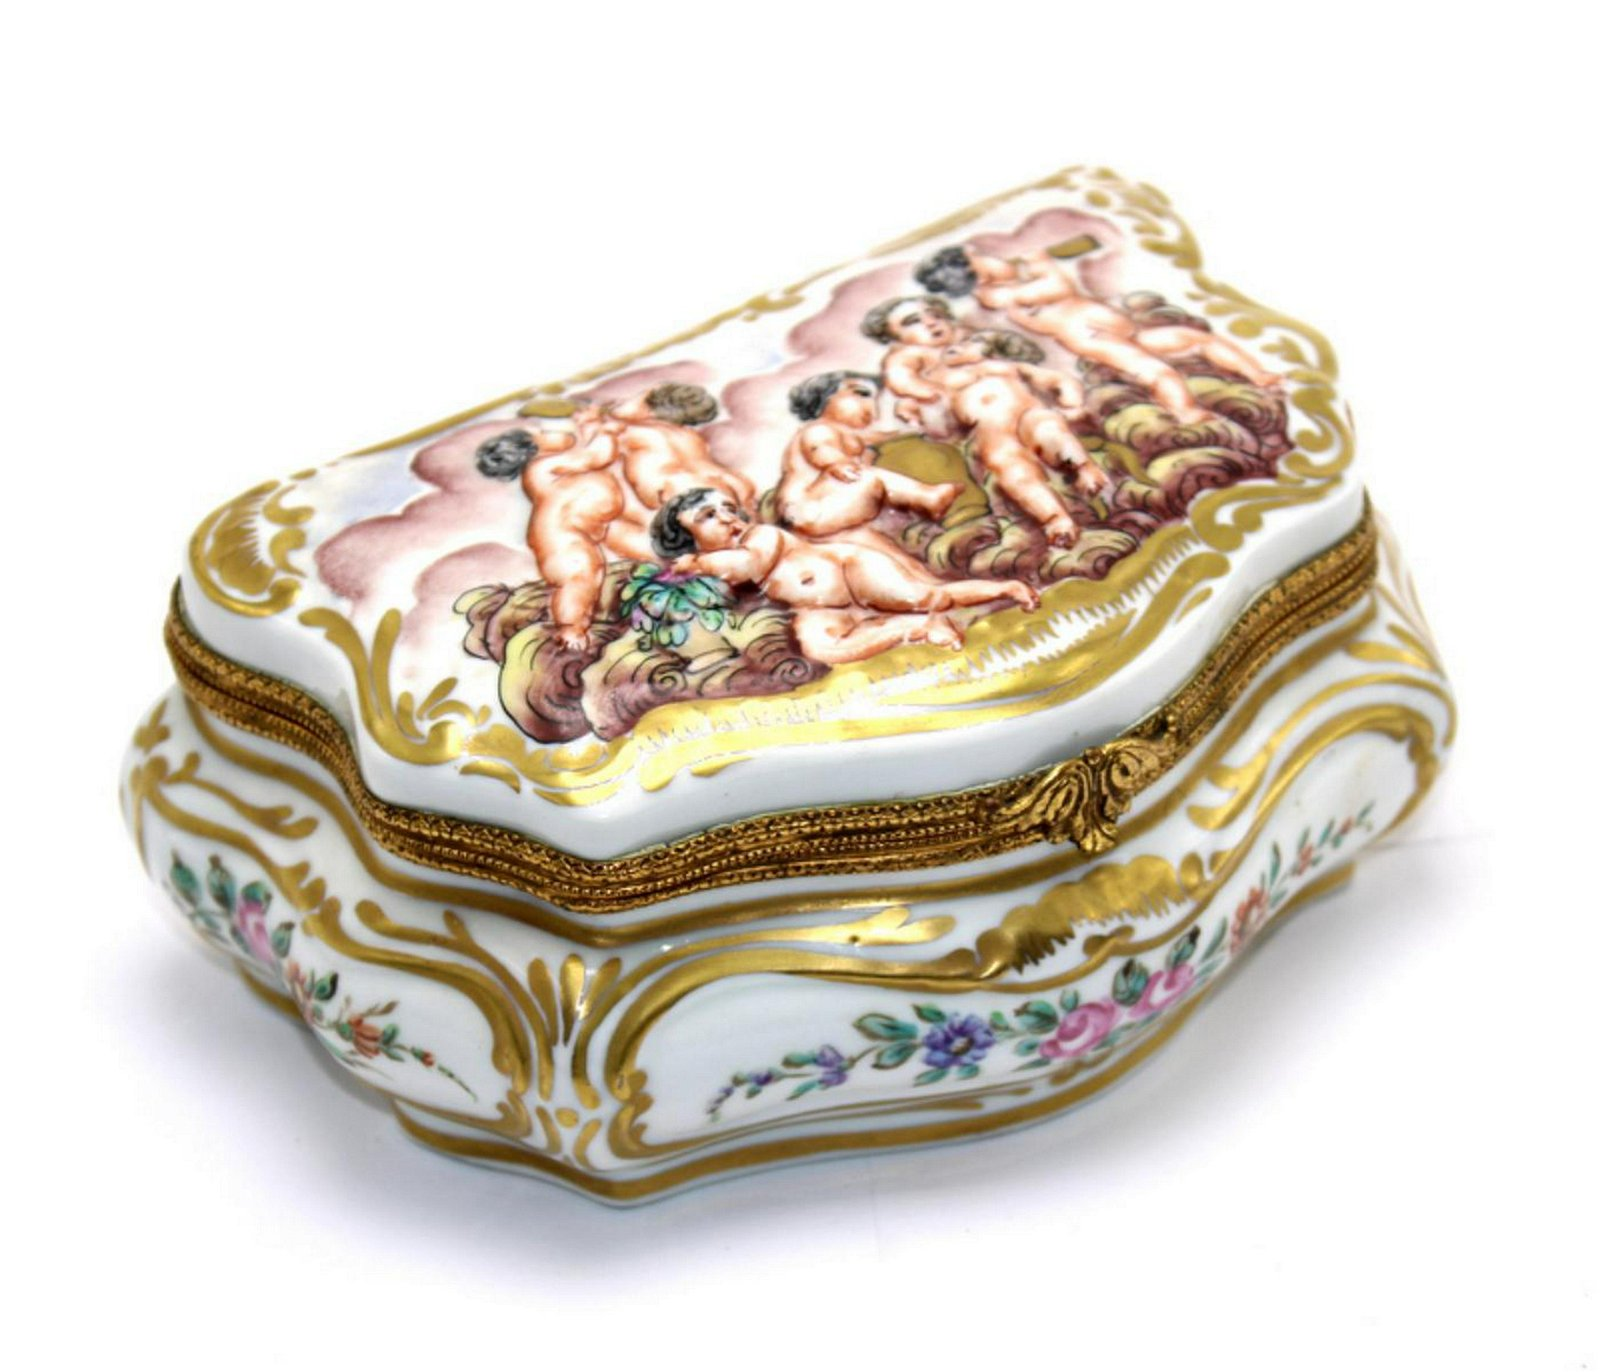 Antique Capodimonte Porcelain Box